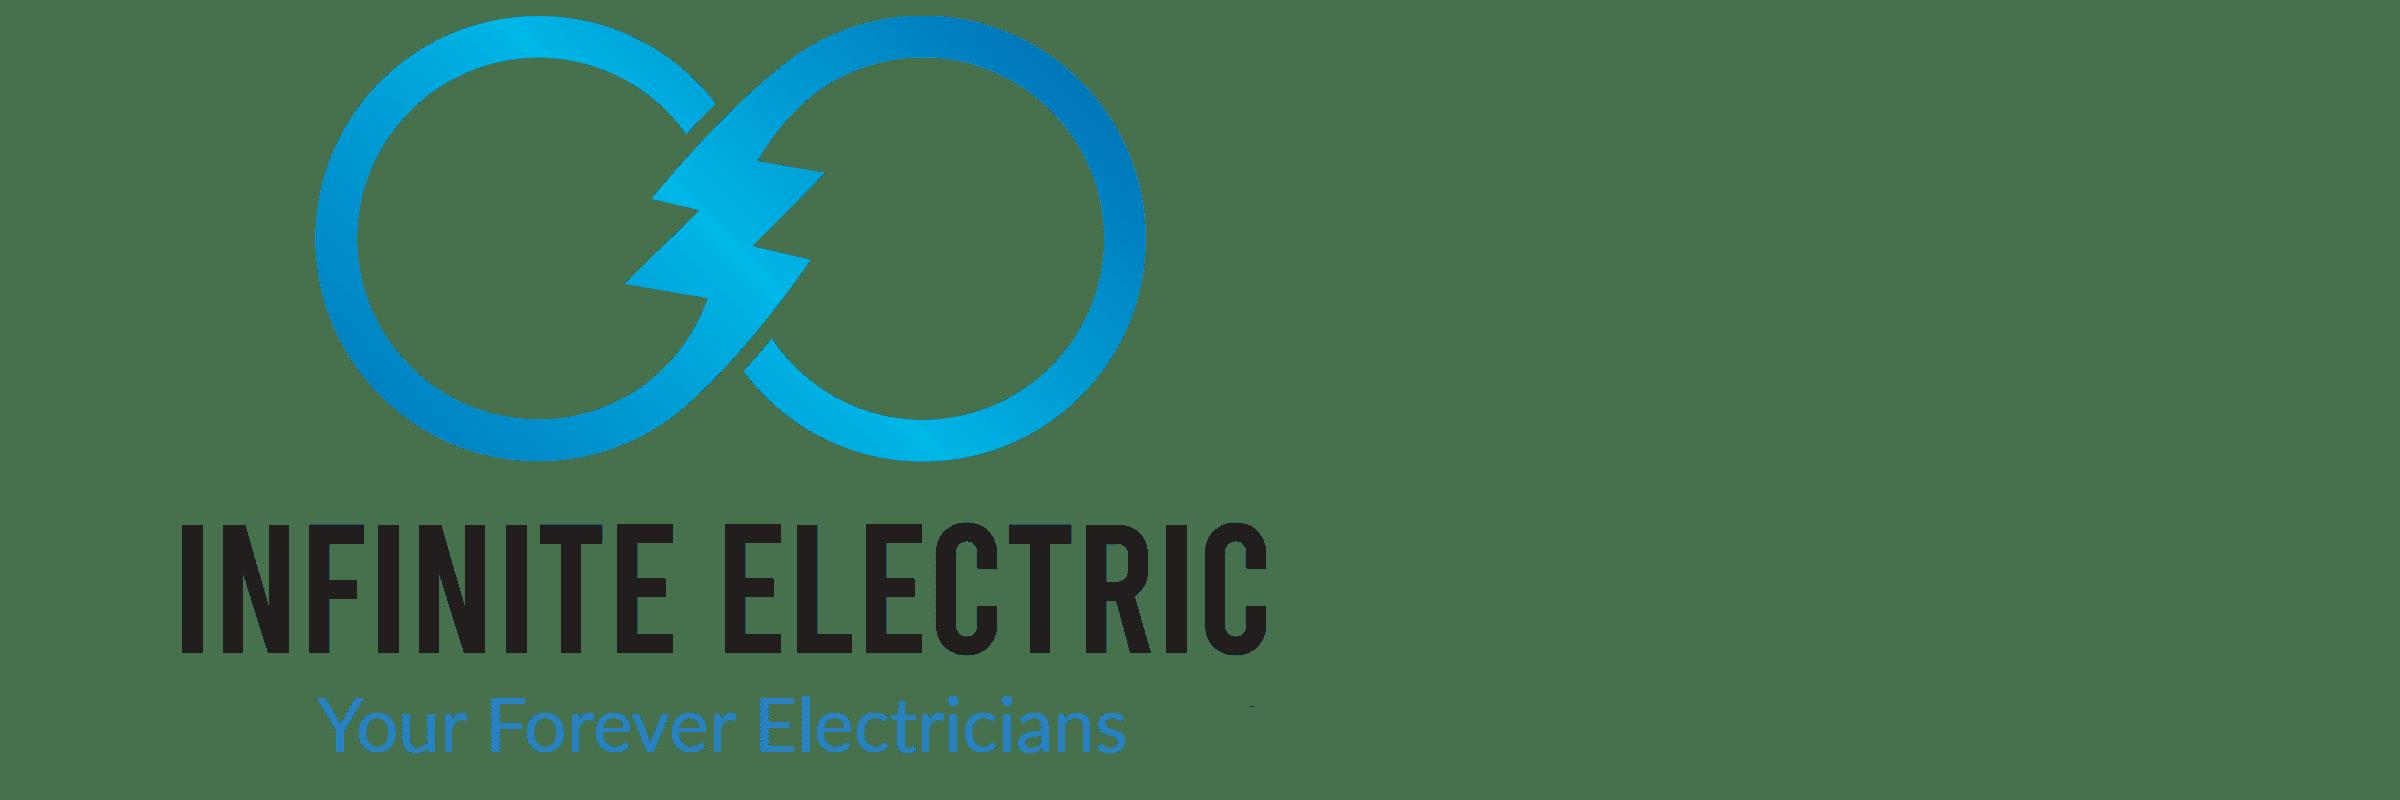 Infinite Electric